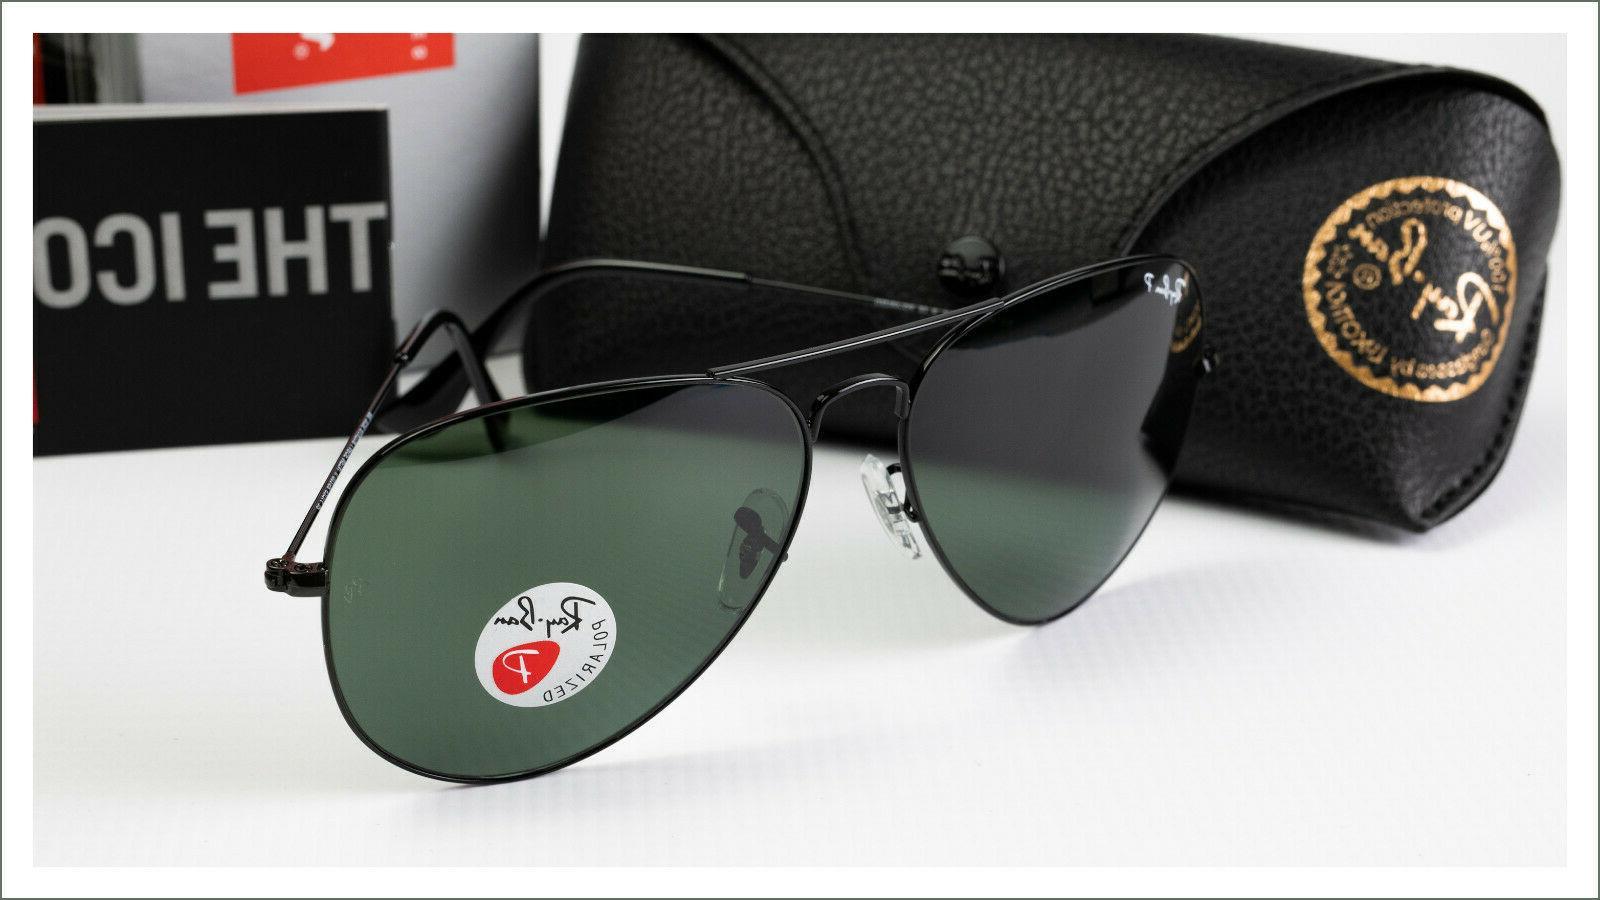 RayBan RB3025-002/18 AVIATOR BLACK crystal green Polarized 5